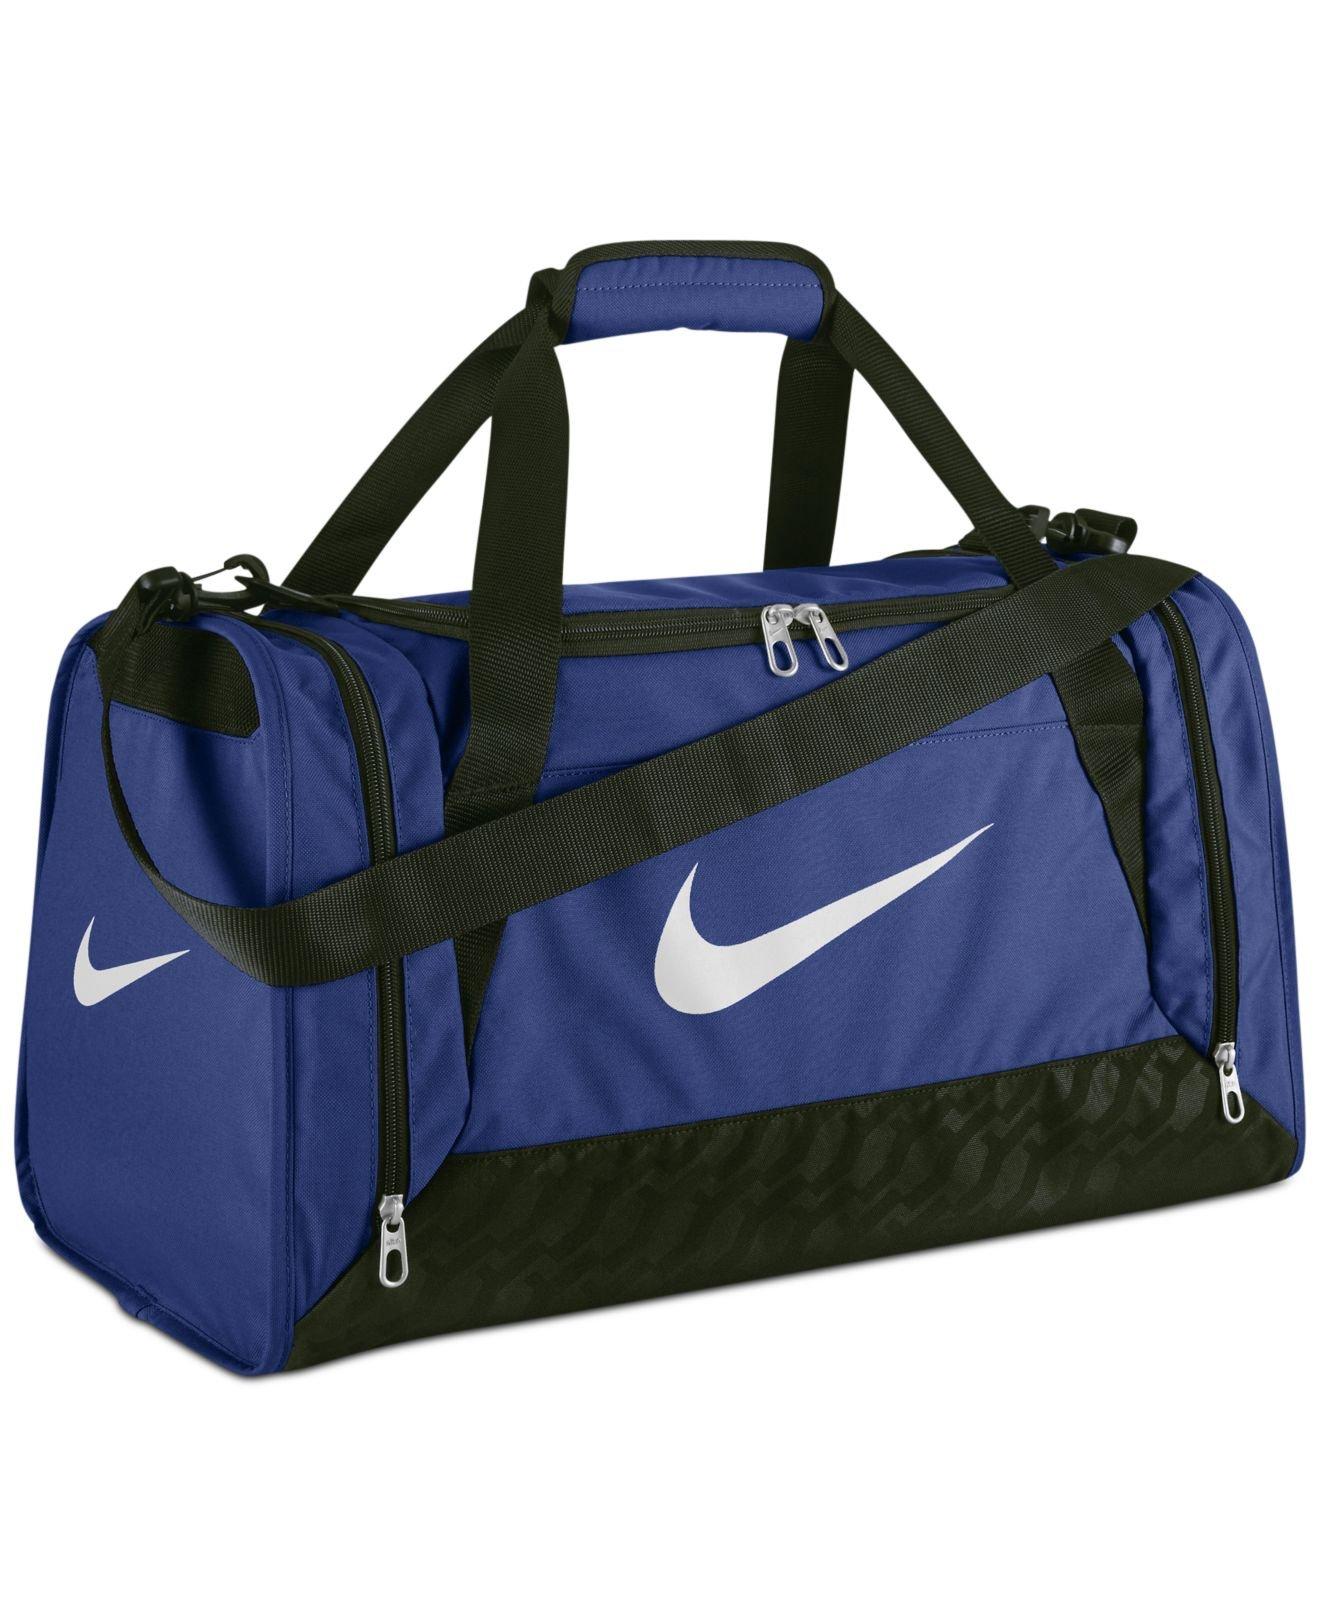 3d6088cd16 Lyst - Nike Brasilia 6 Small Duffle Bag in Blue for Men